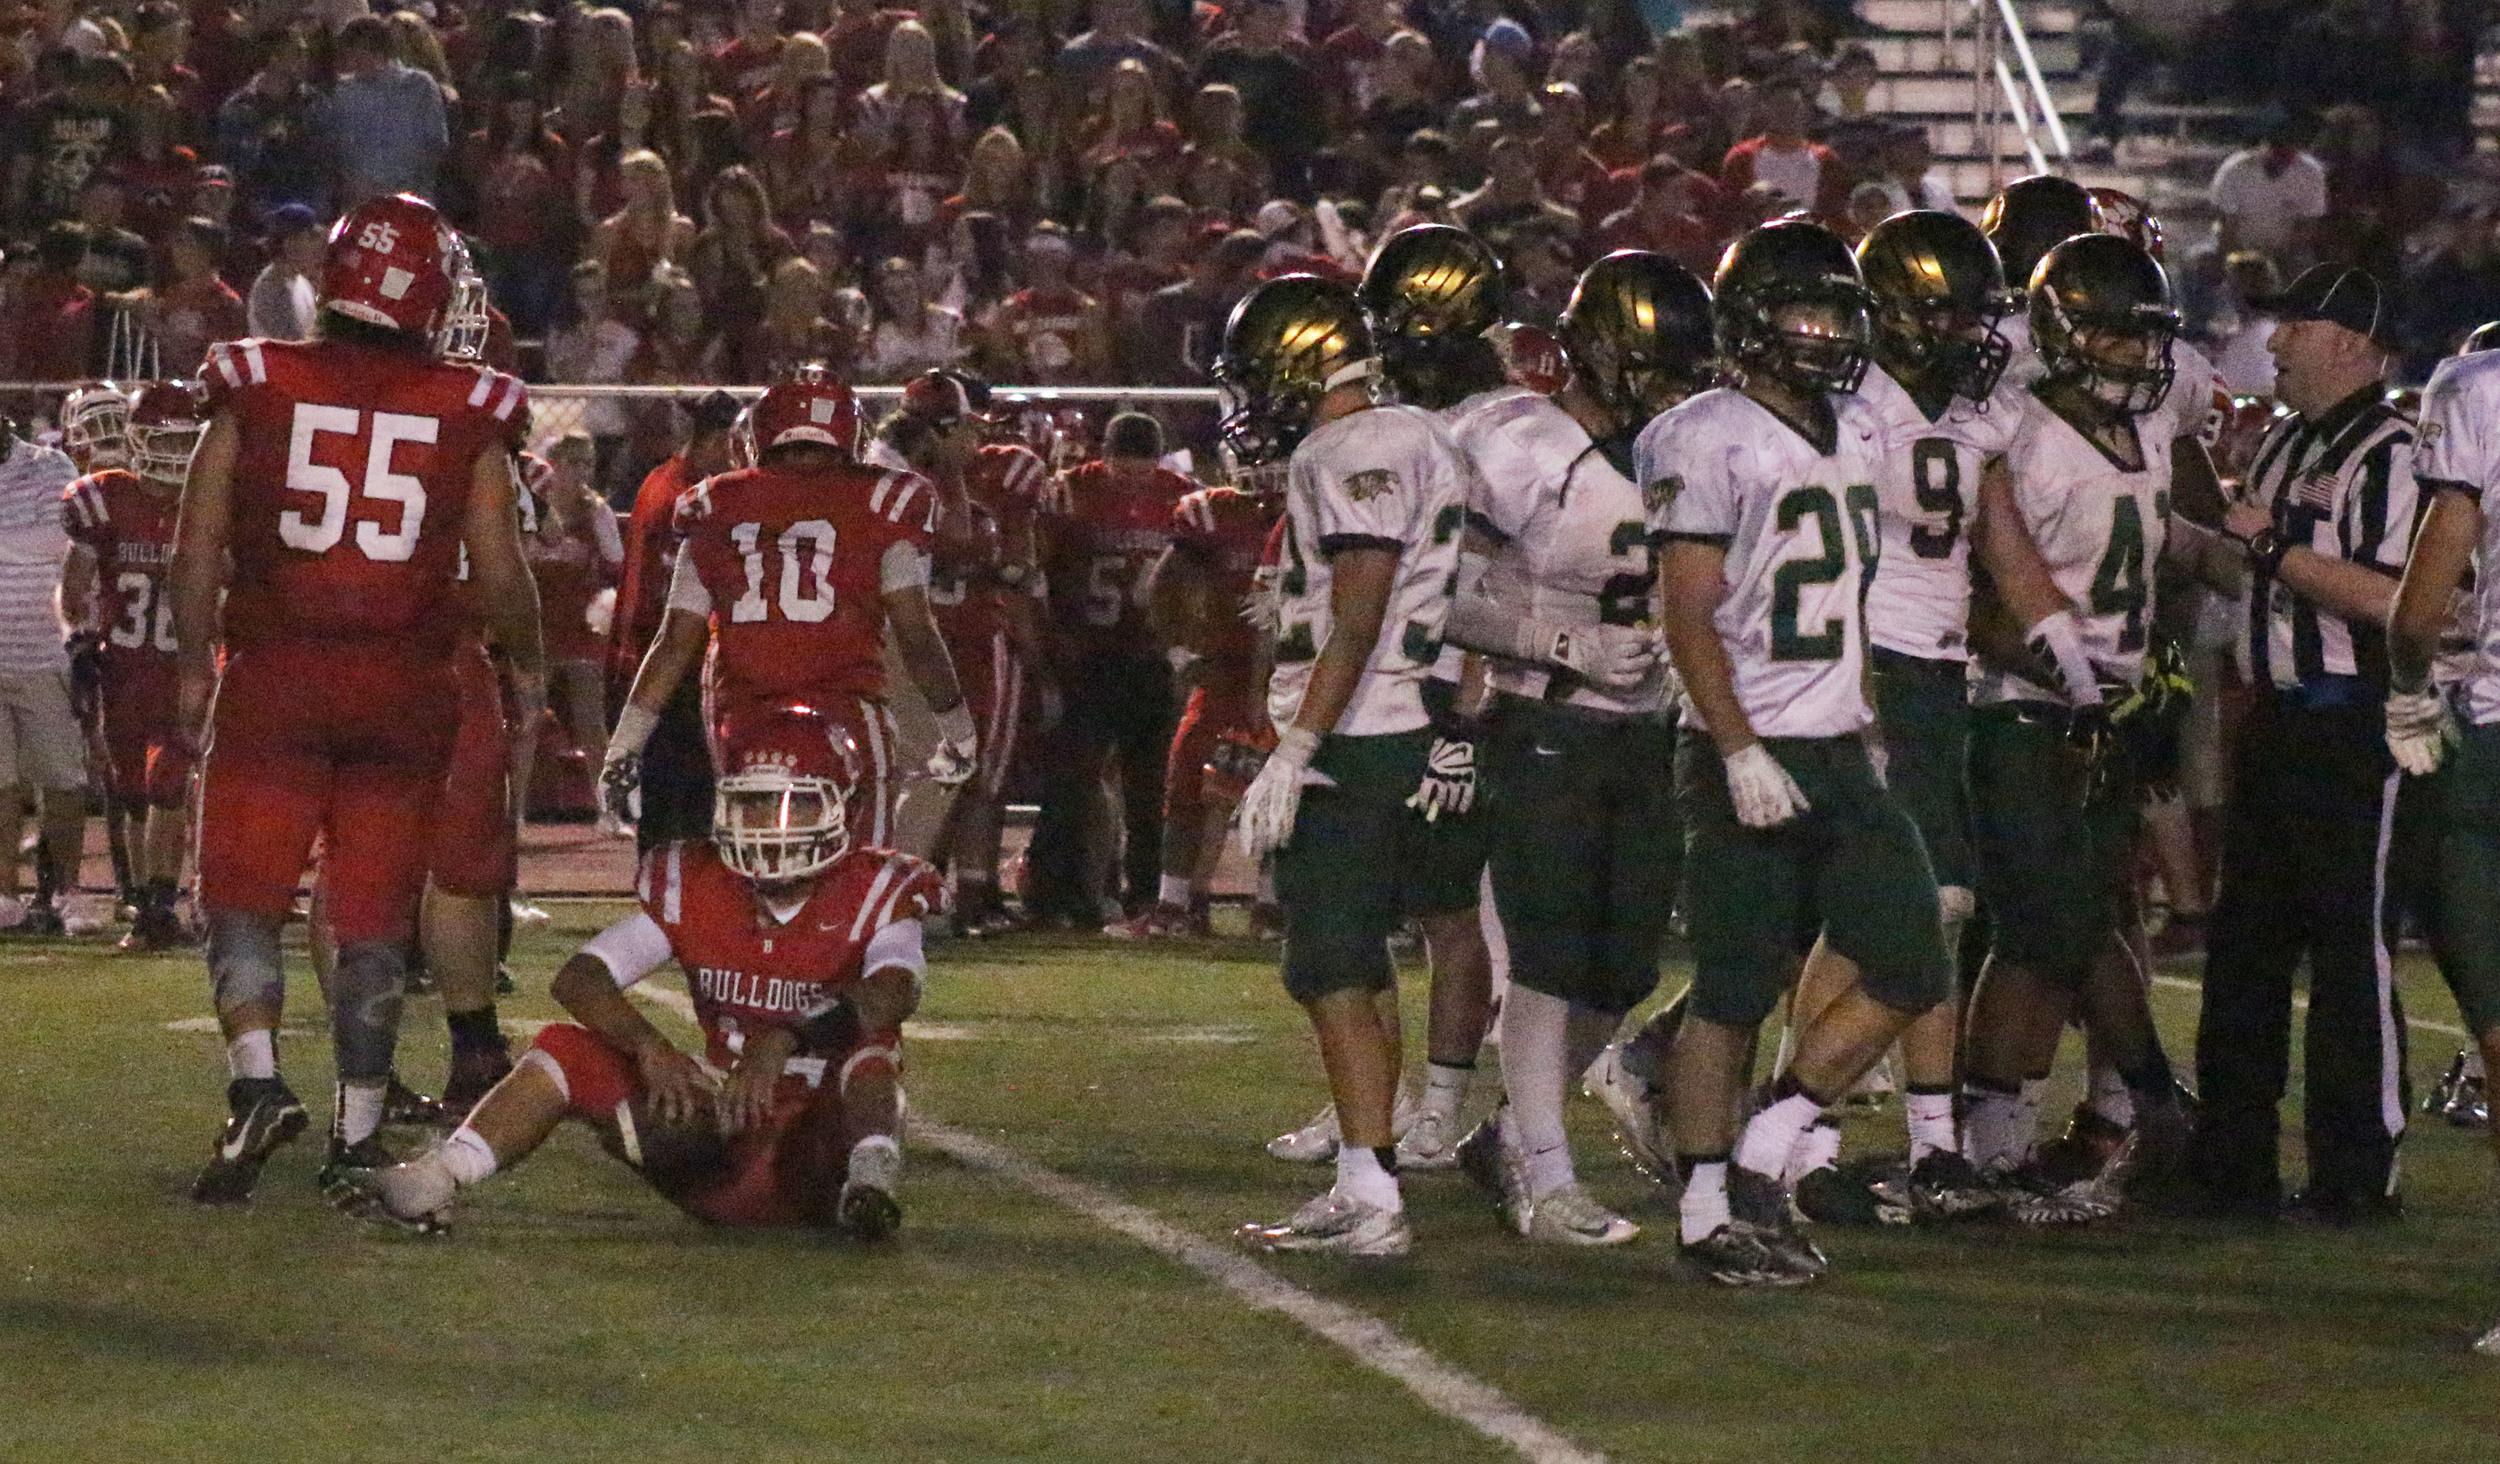 Brighton's quarterback, senior Brady Jacovetta, sits on the floor after a 10-yard sack by Mountain Vista senior Matt Yockey prevented the Bulldogs from reaching a first down.